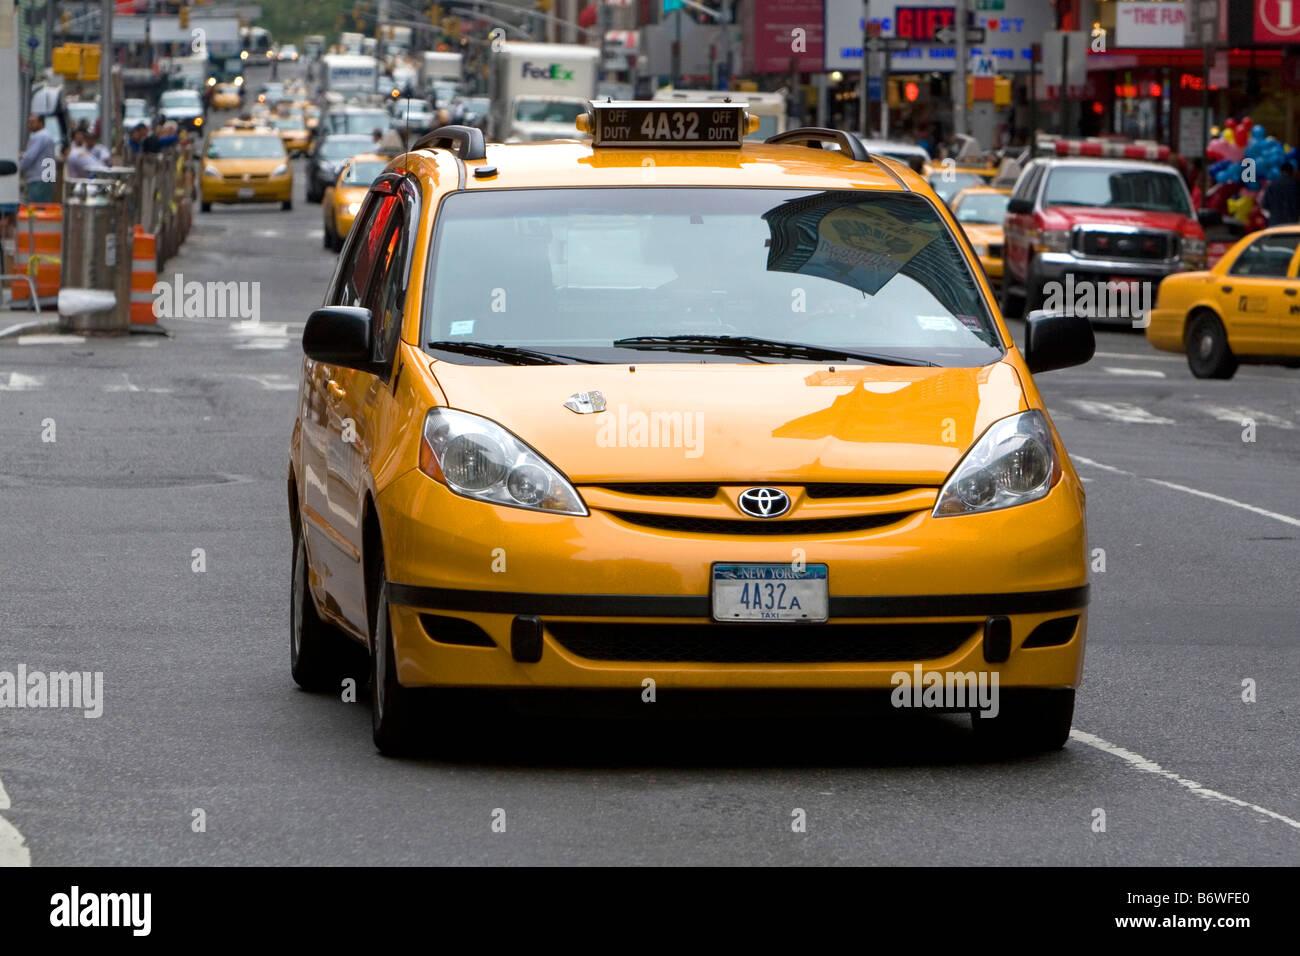 Toyota taxicab in Manhattan New York City New York USA - Stock Image